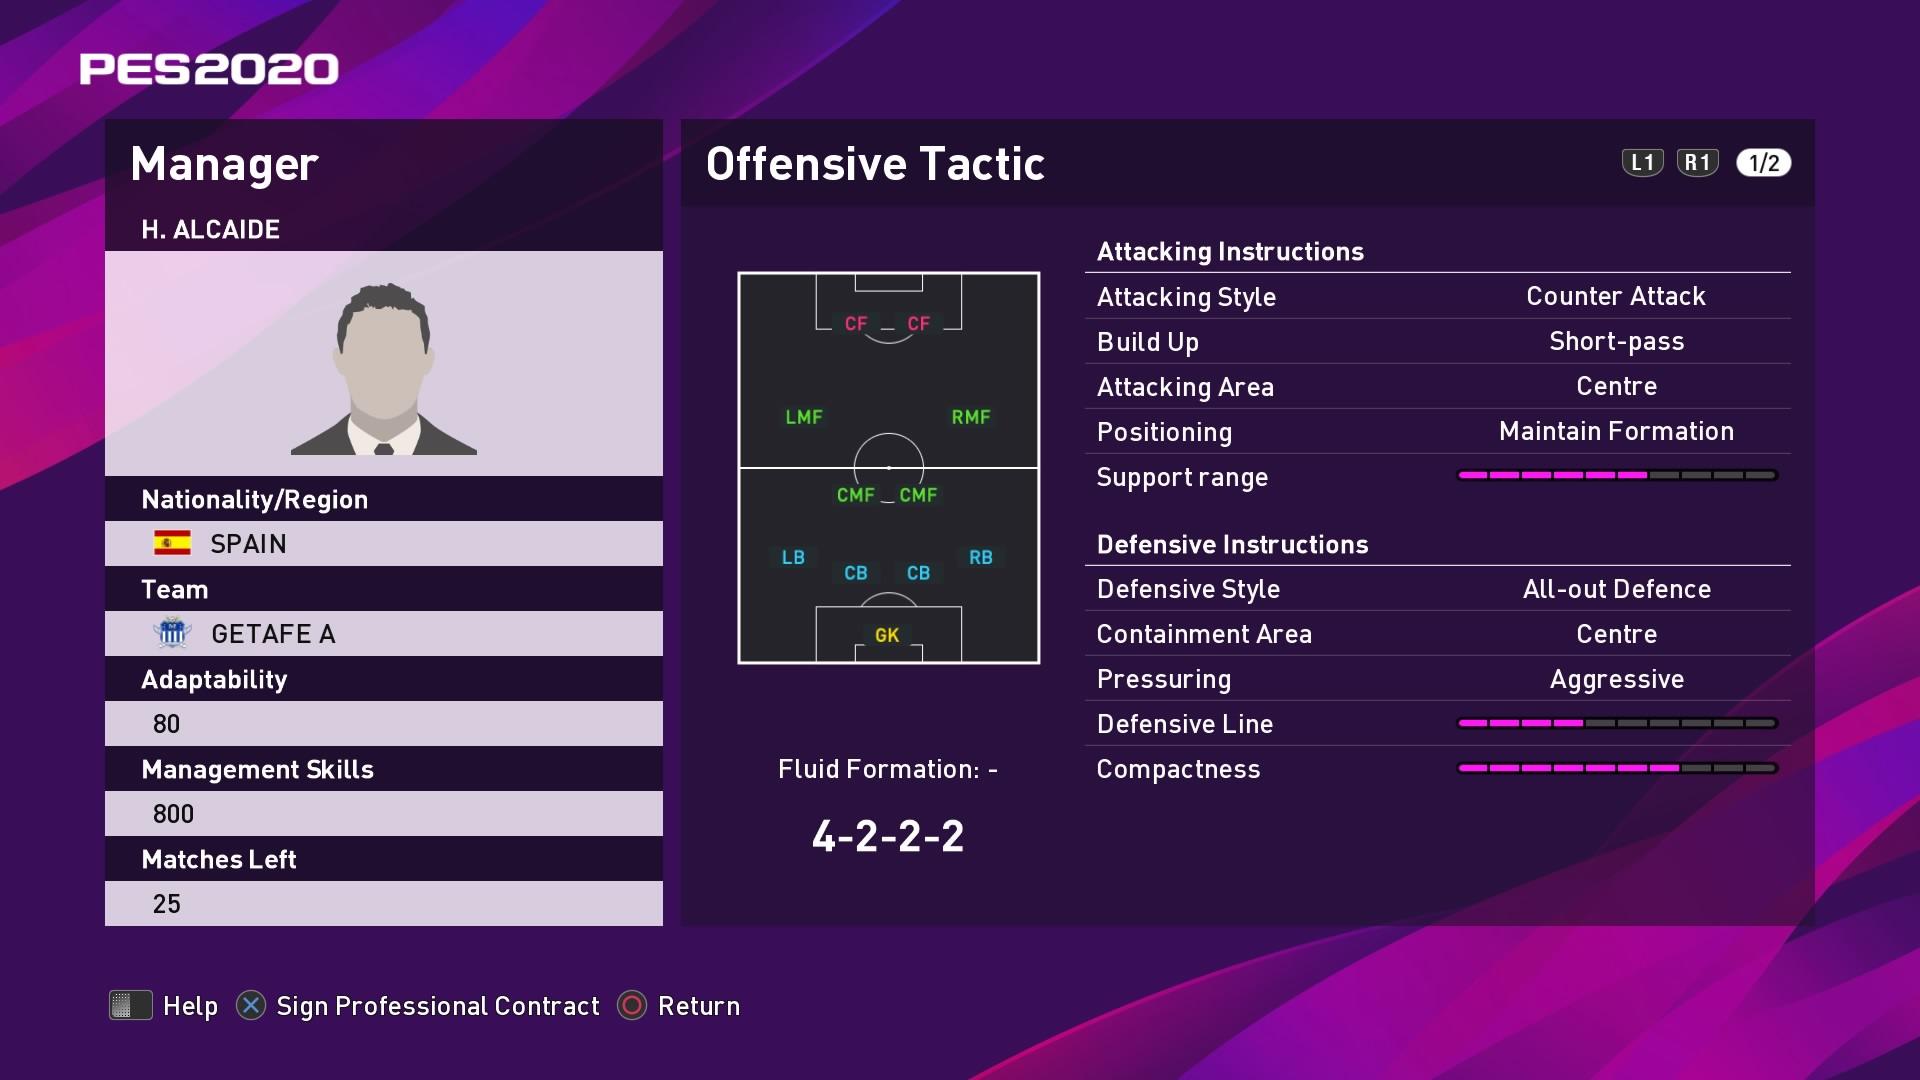 H. Alcaide (José Bordalás) Offensive Tactic in PES 2020 myClub